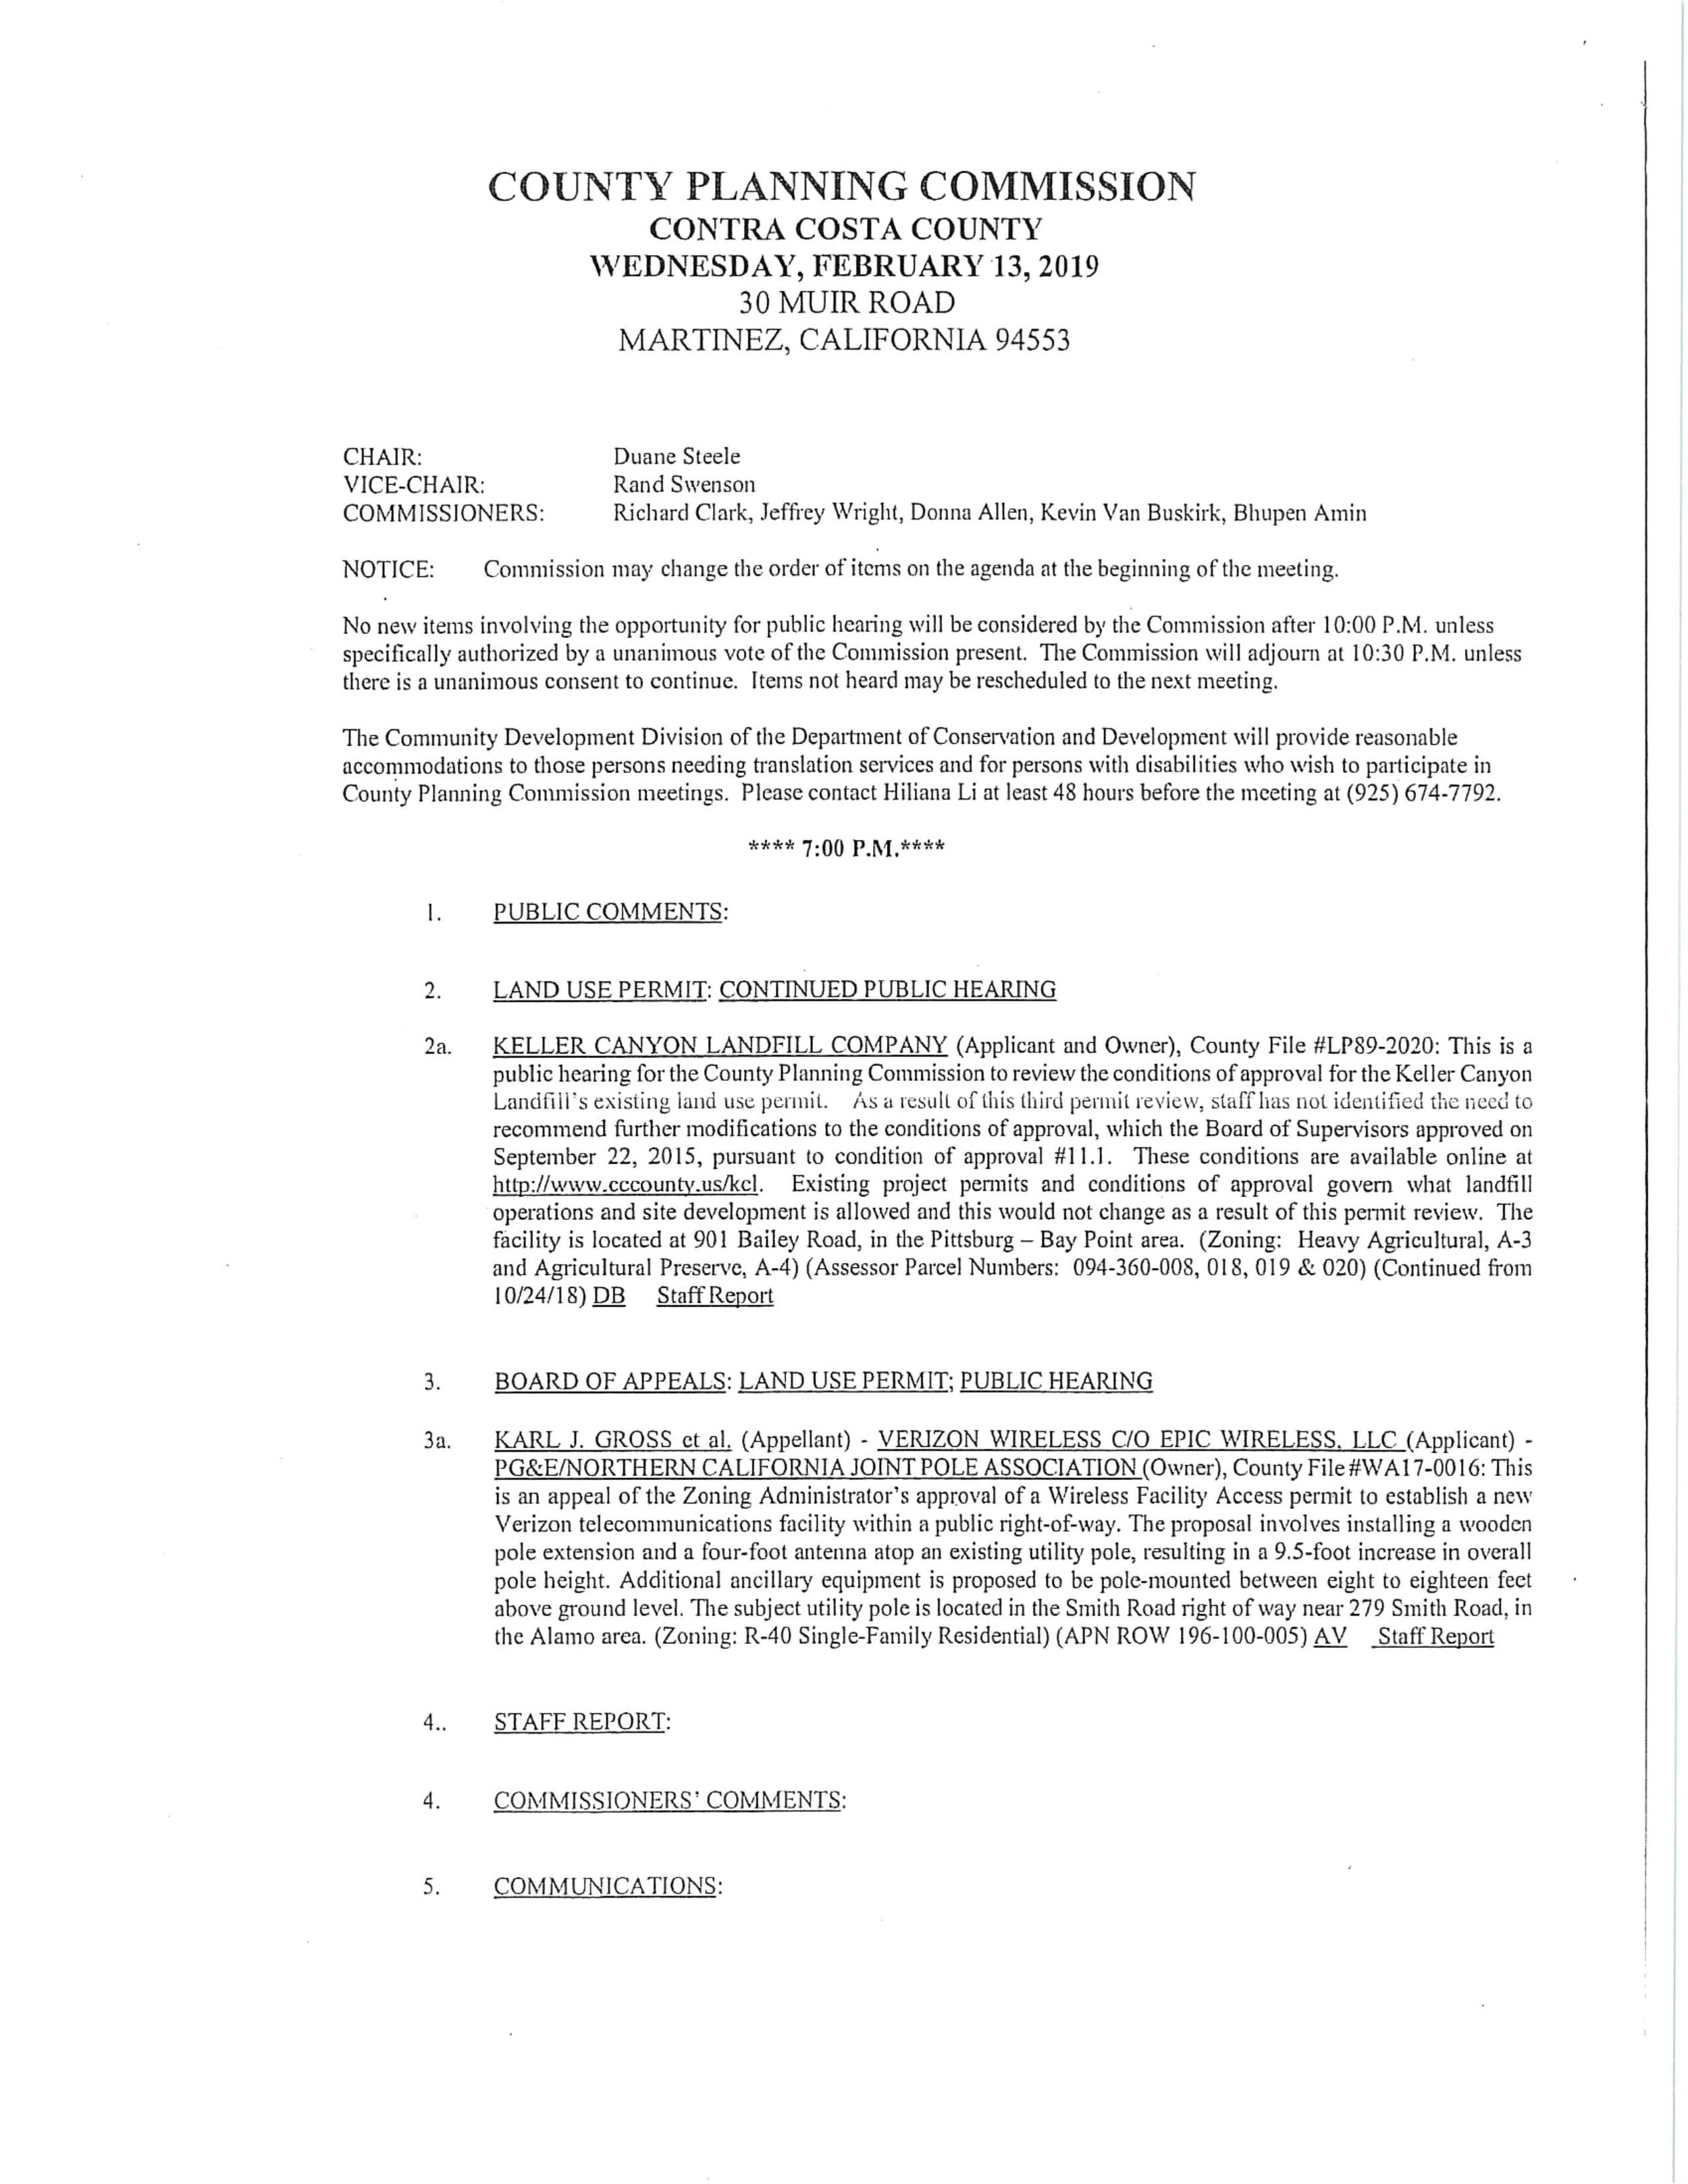 ESMAC Agenda 2.13.2019b_44.jpg